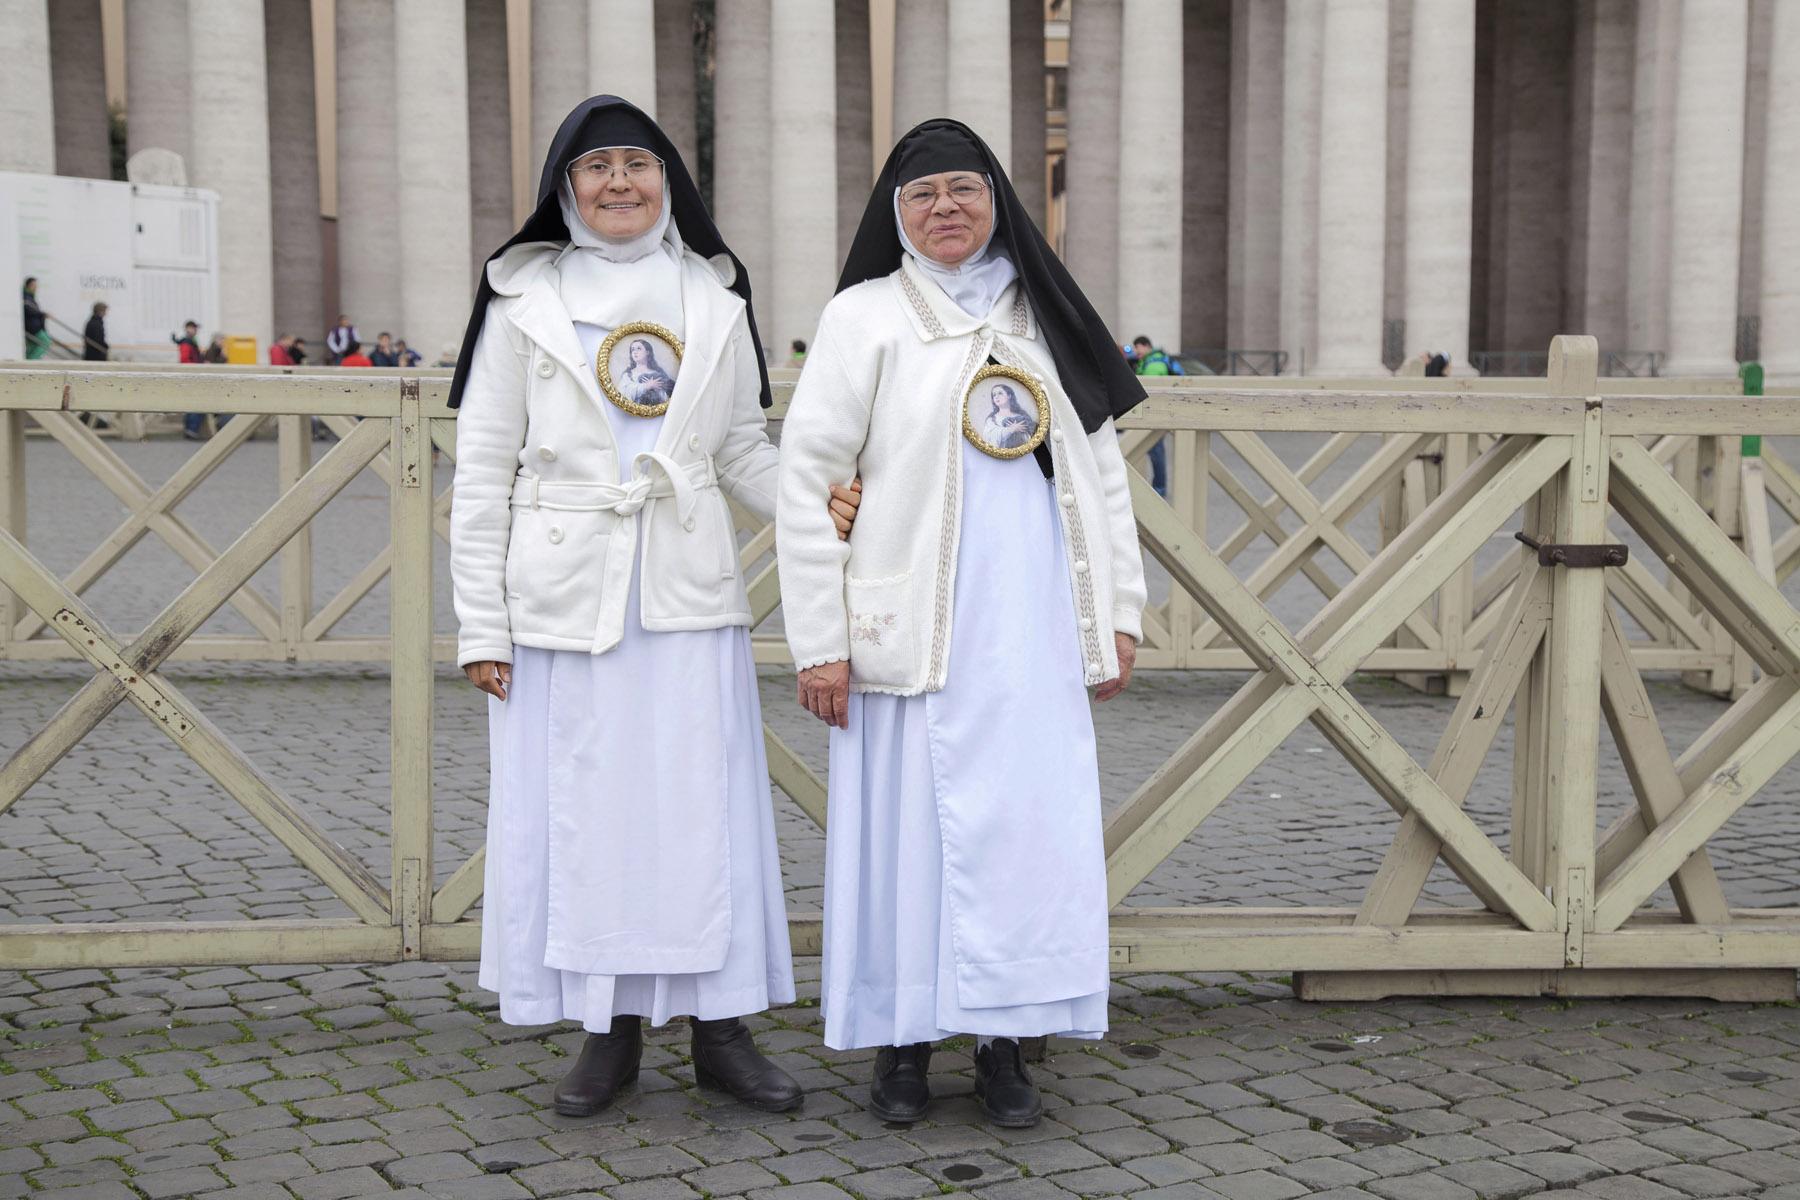 Chiara Spaghetti Kurtovic Popes Two 29